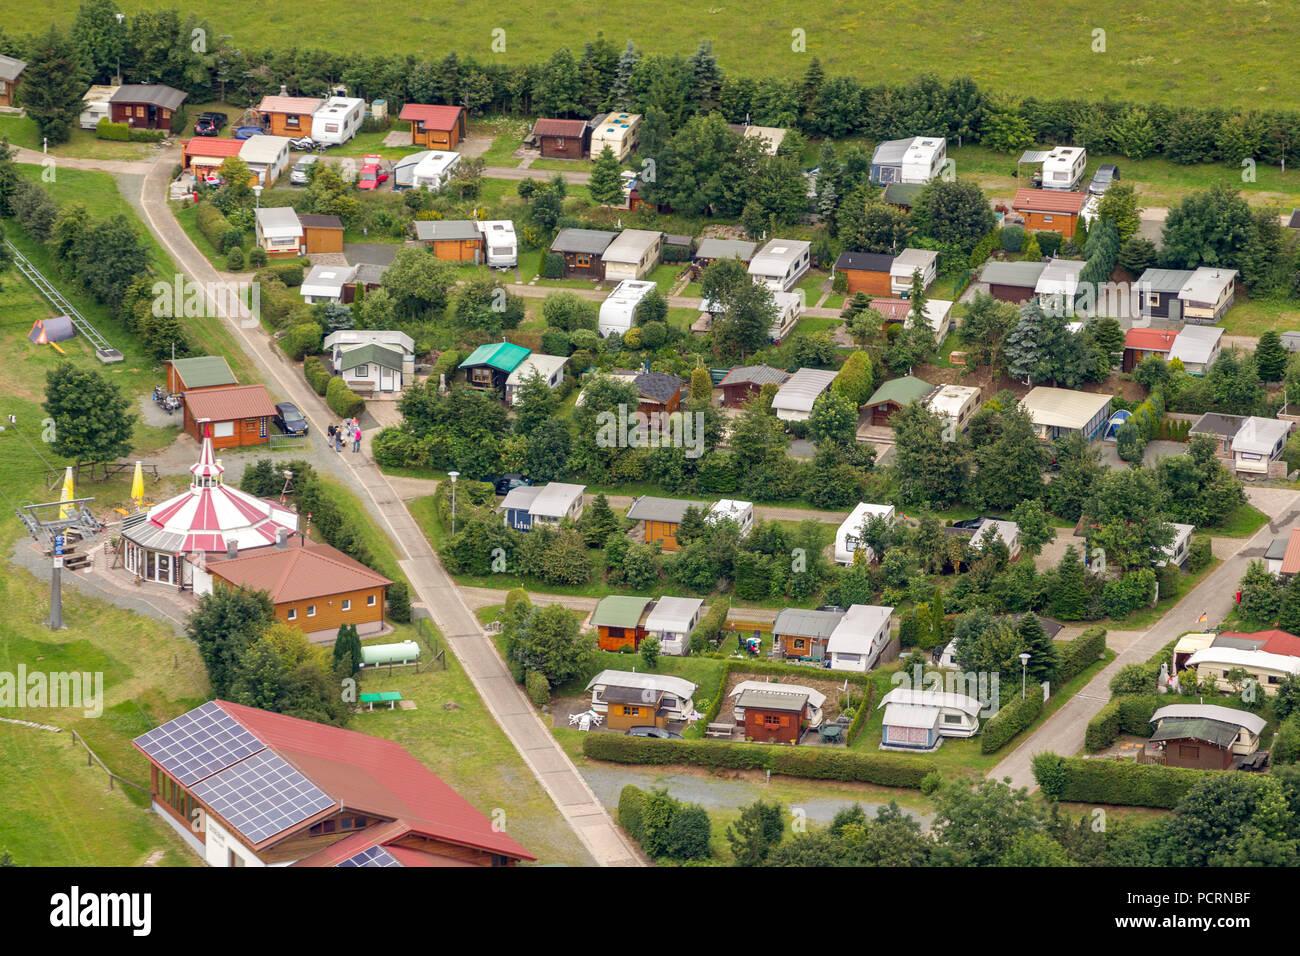 Luftaufnahme Caravan Park Campingpark Hochsauerland Campingplatz